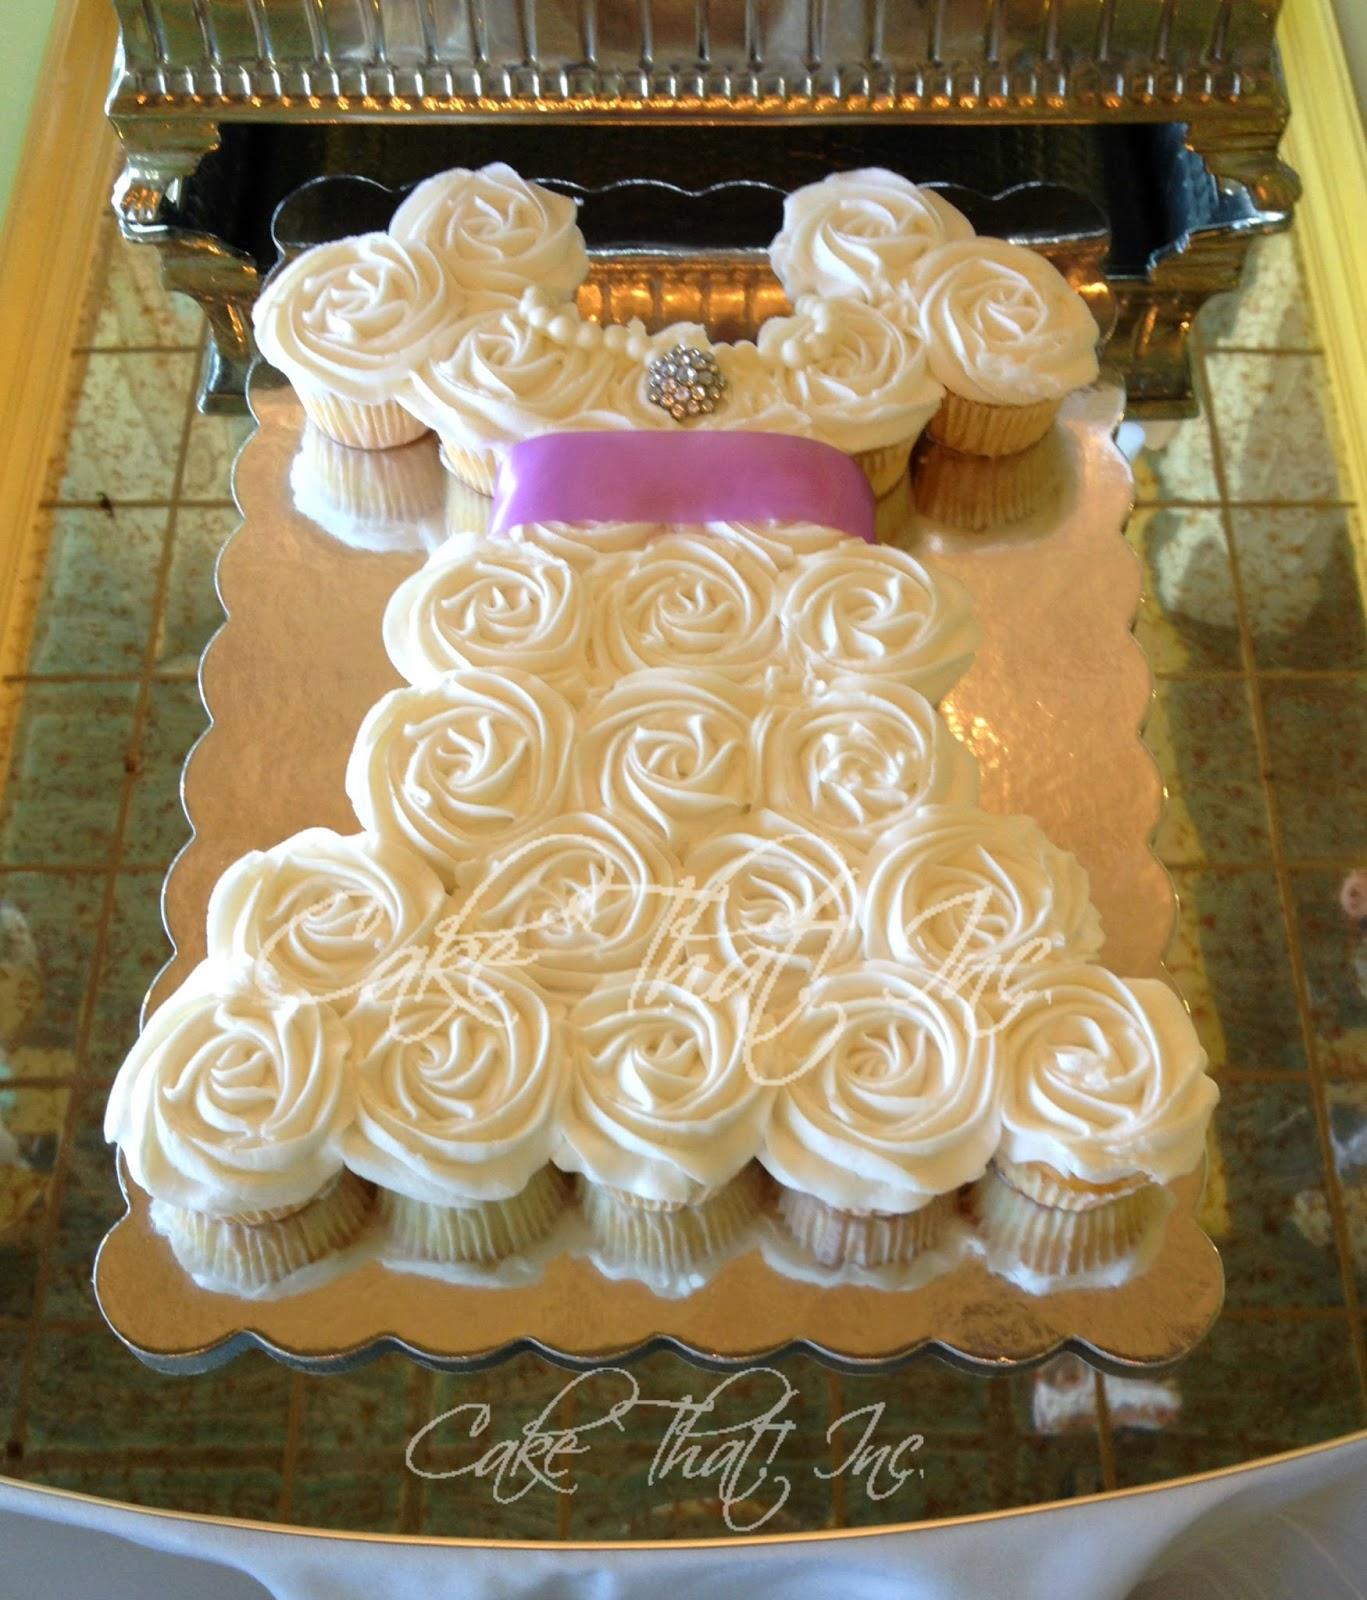 Cake That! Inc.